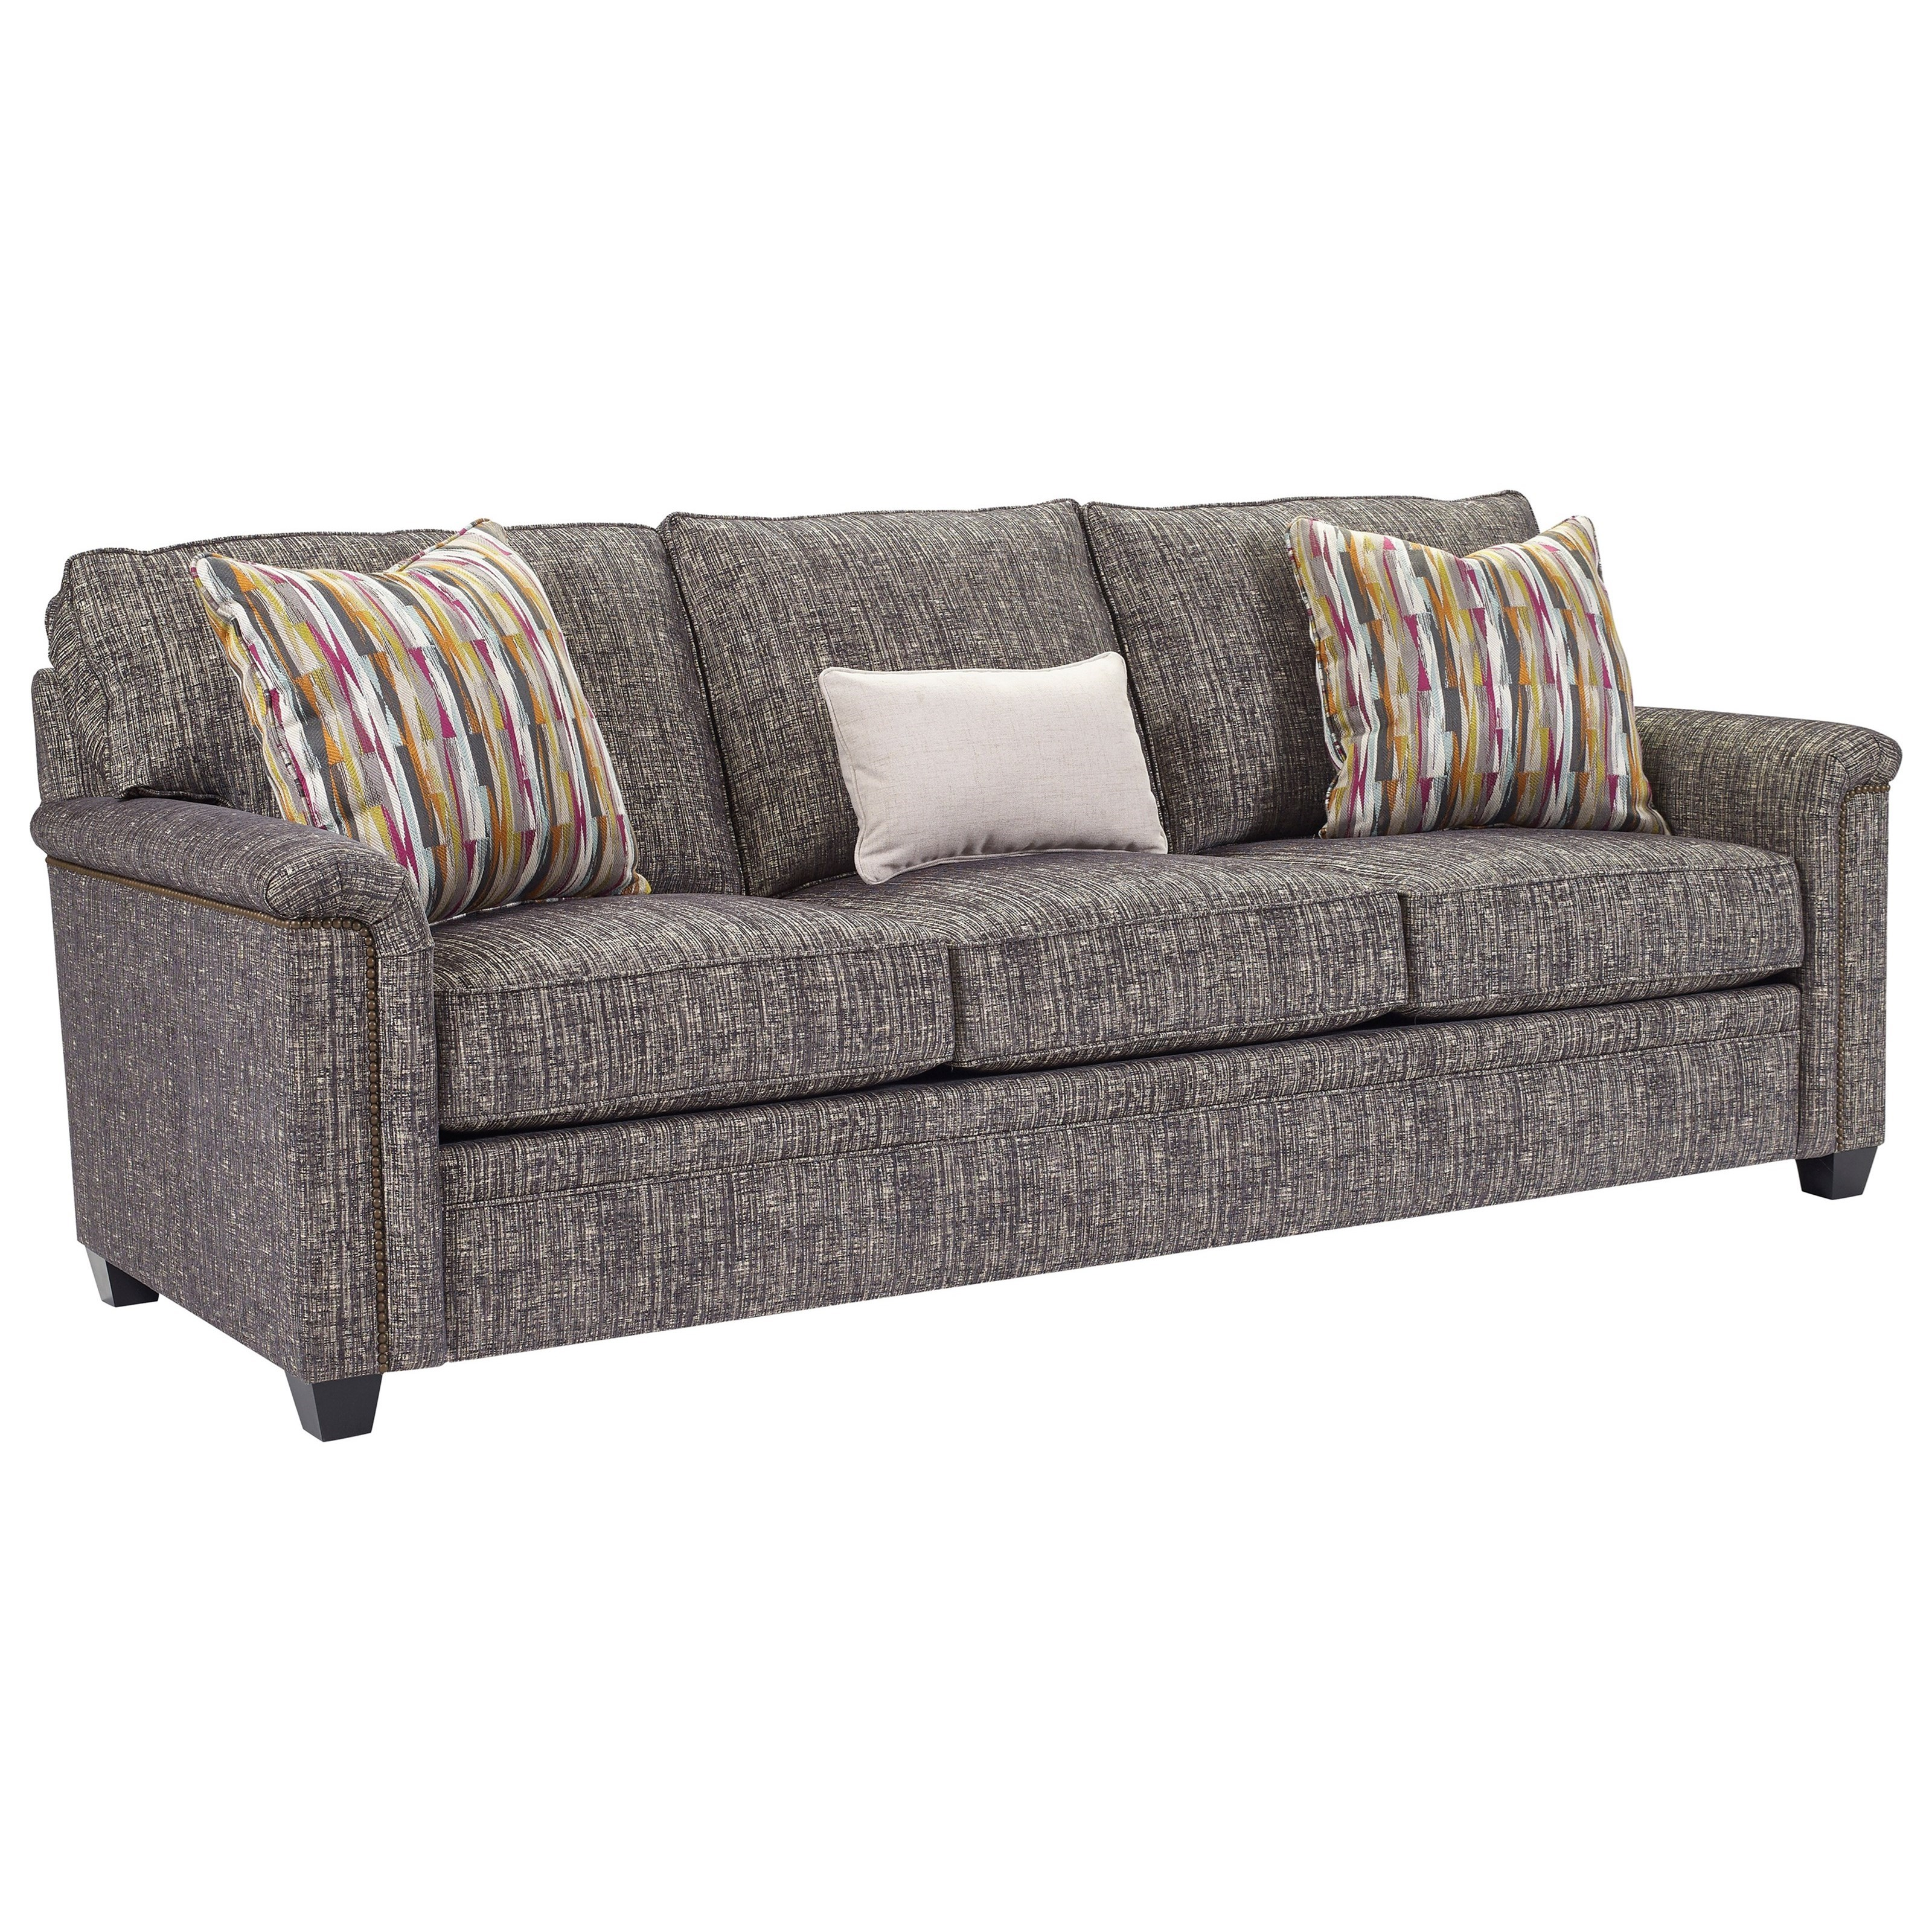 Broyhill Furniture Warren Sofa - Item Number: 4287-3-4681-38